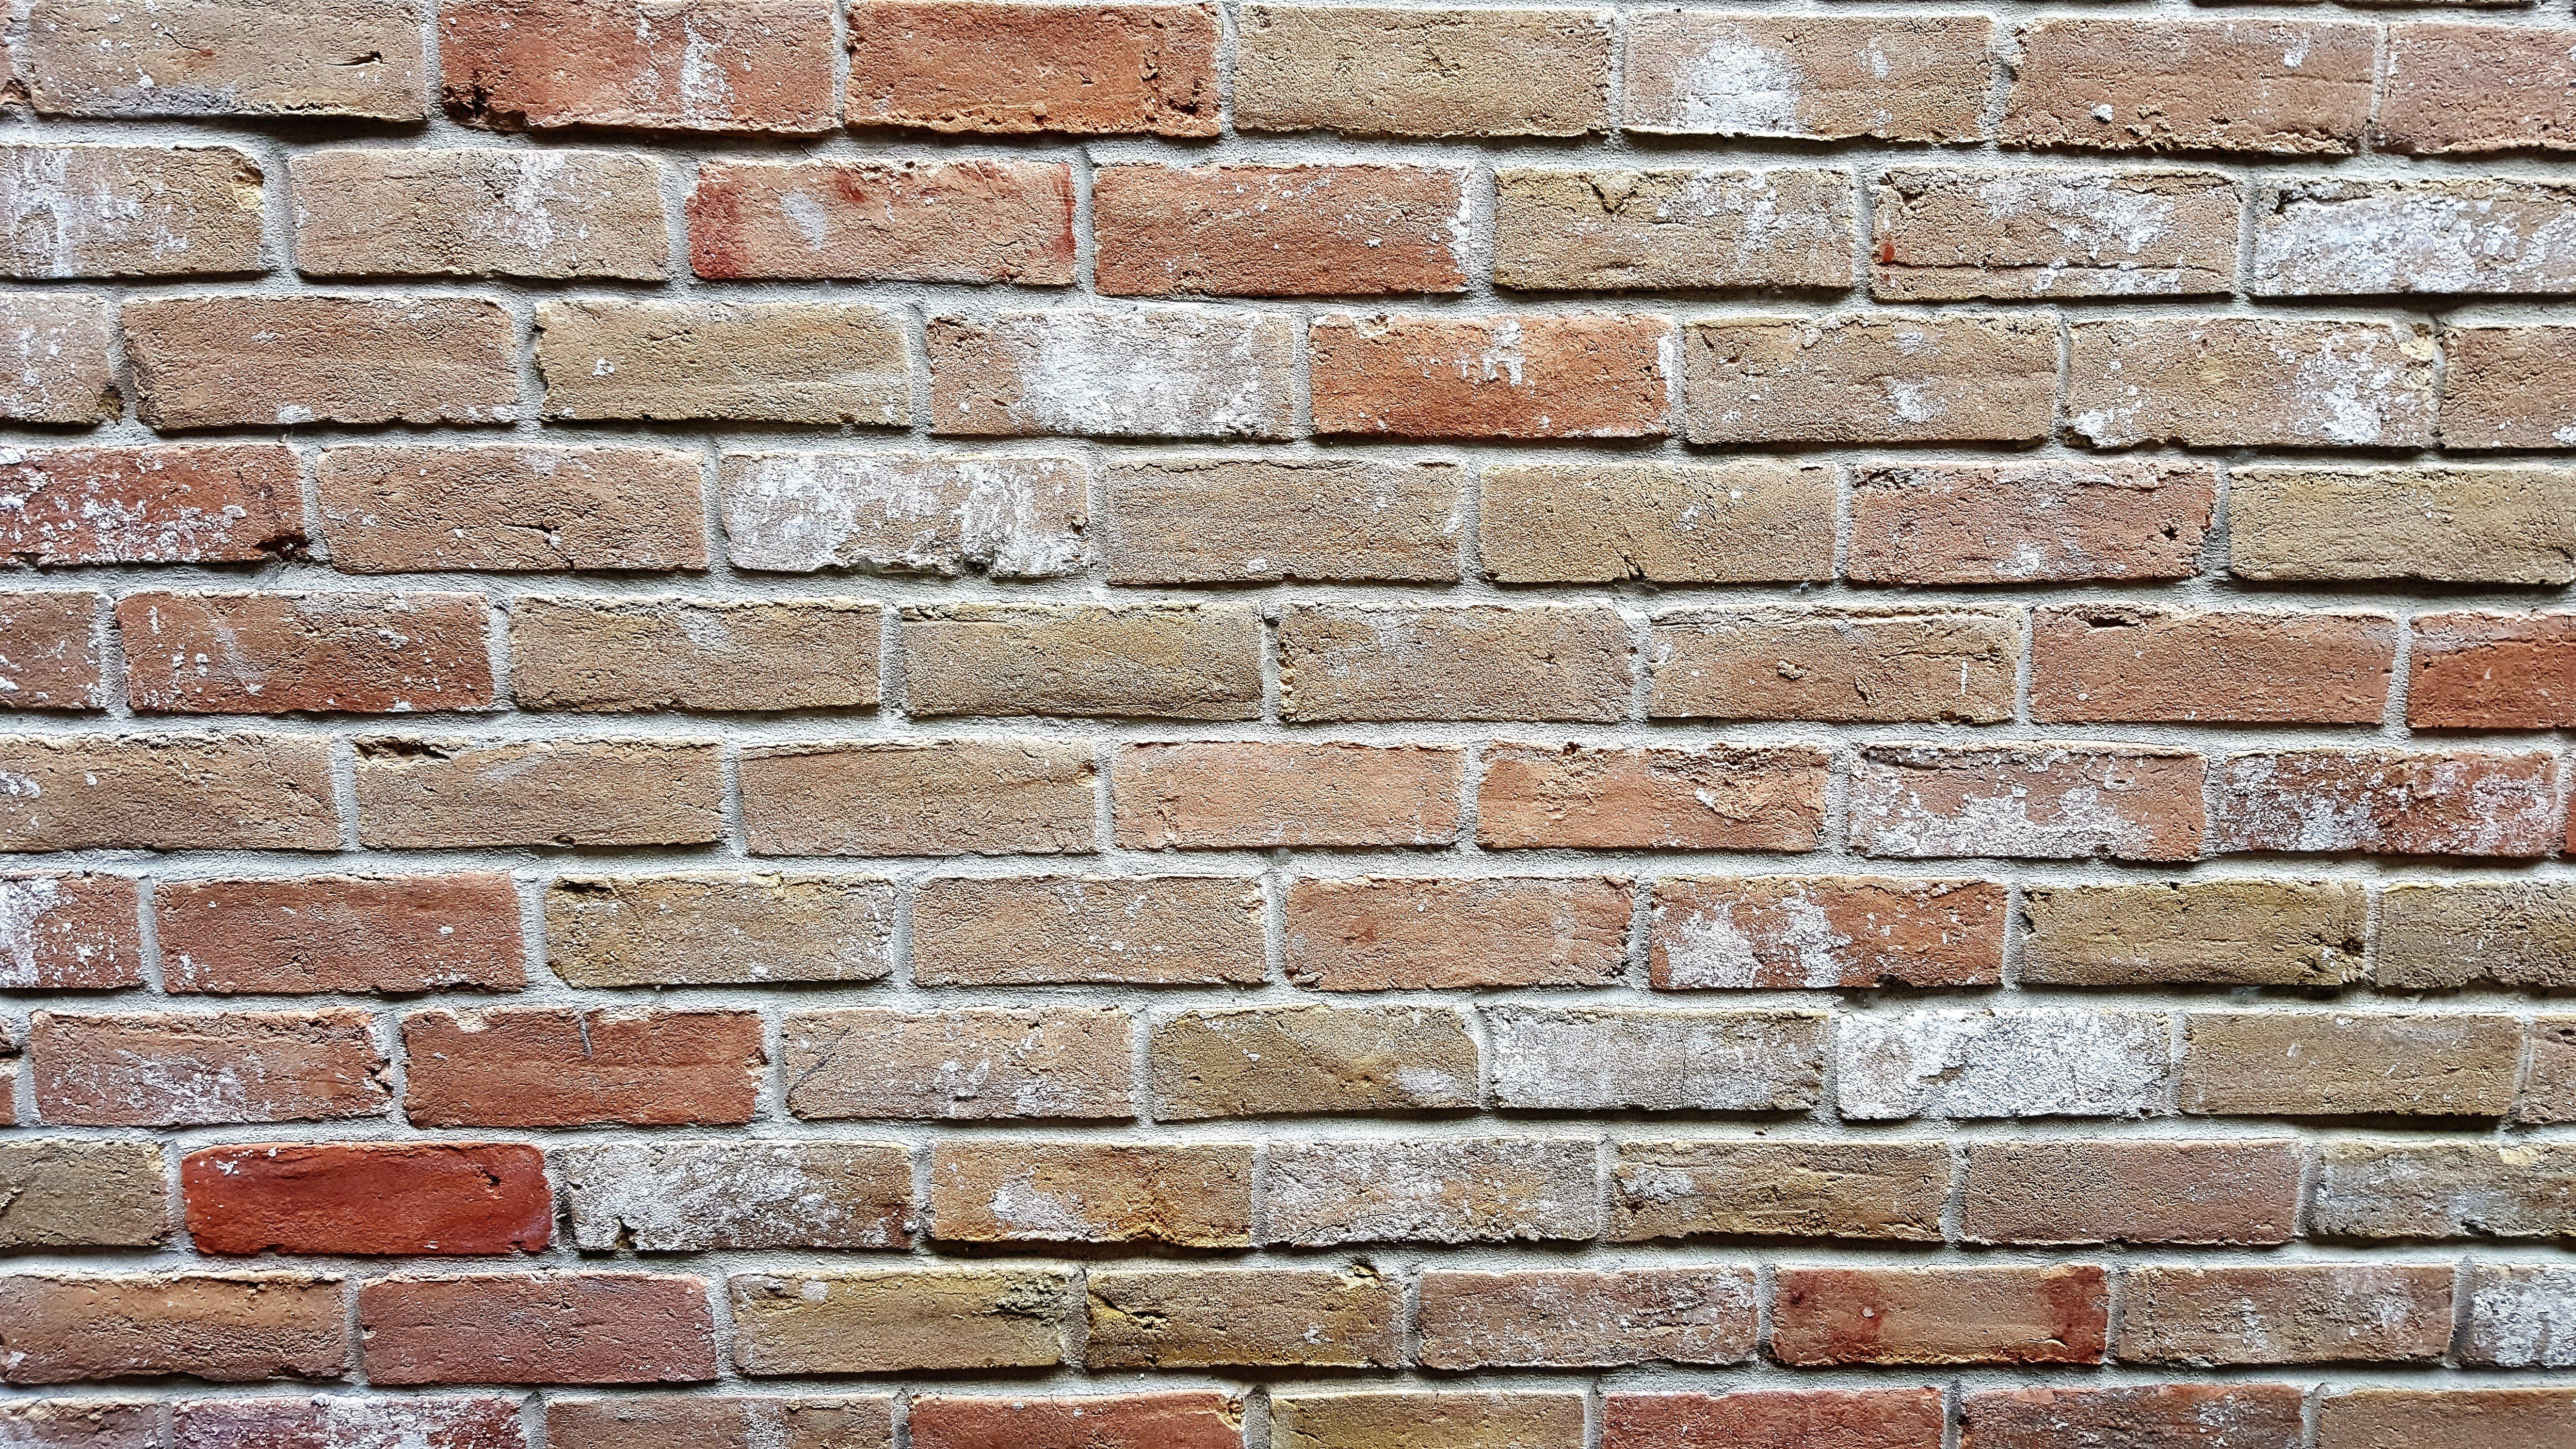 mortar crack repair in Woodlands,TX., Mortar cracks repair in Spring,TX.,brick mortar repair repair in champion forest, brick repair contractor in Tomball,TX., brick mortar color match, brick repair in Houston,TX.